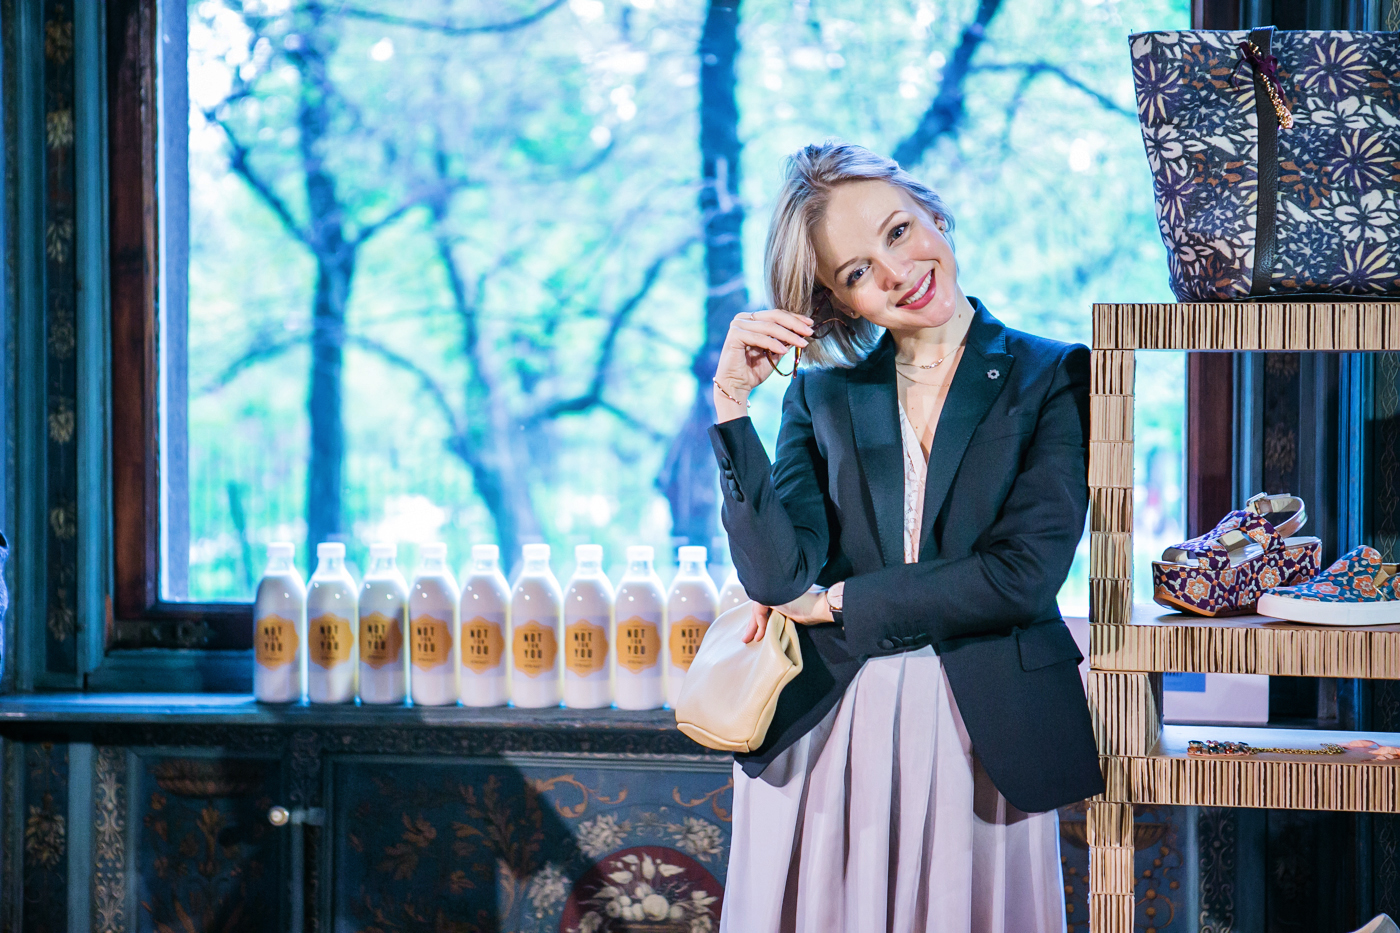 darya kamalova from thecablook com on lardini presentation in Milan and in attila showroom wearing lardini perfect black jacket with marni retro clutch and sophia webster kitten heels-81